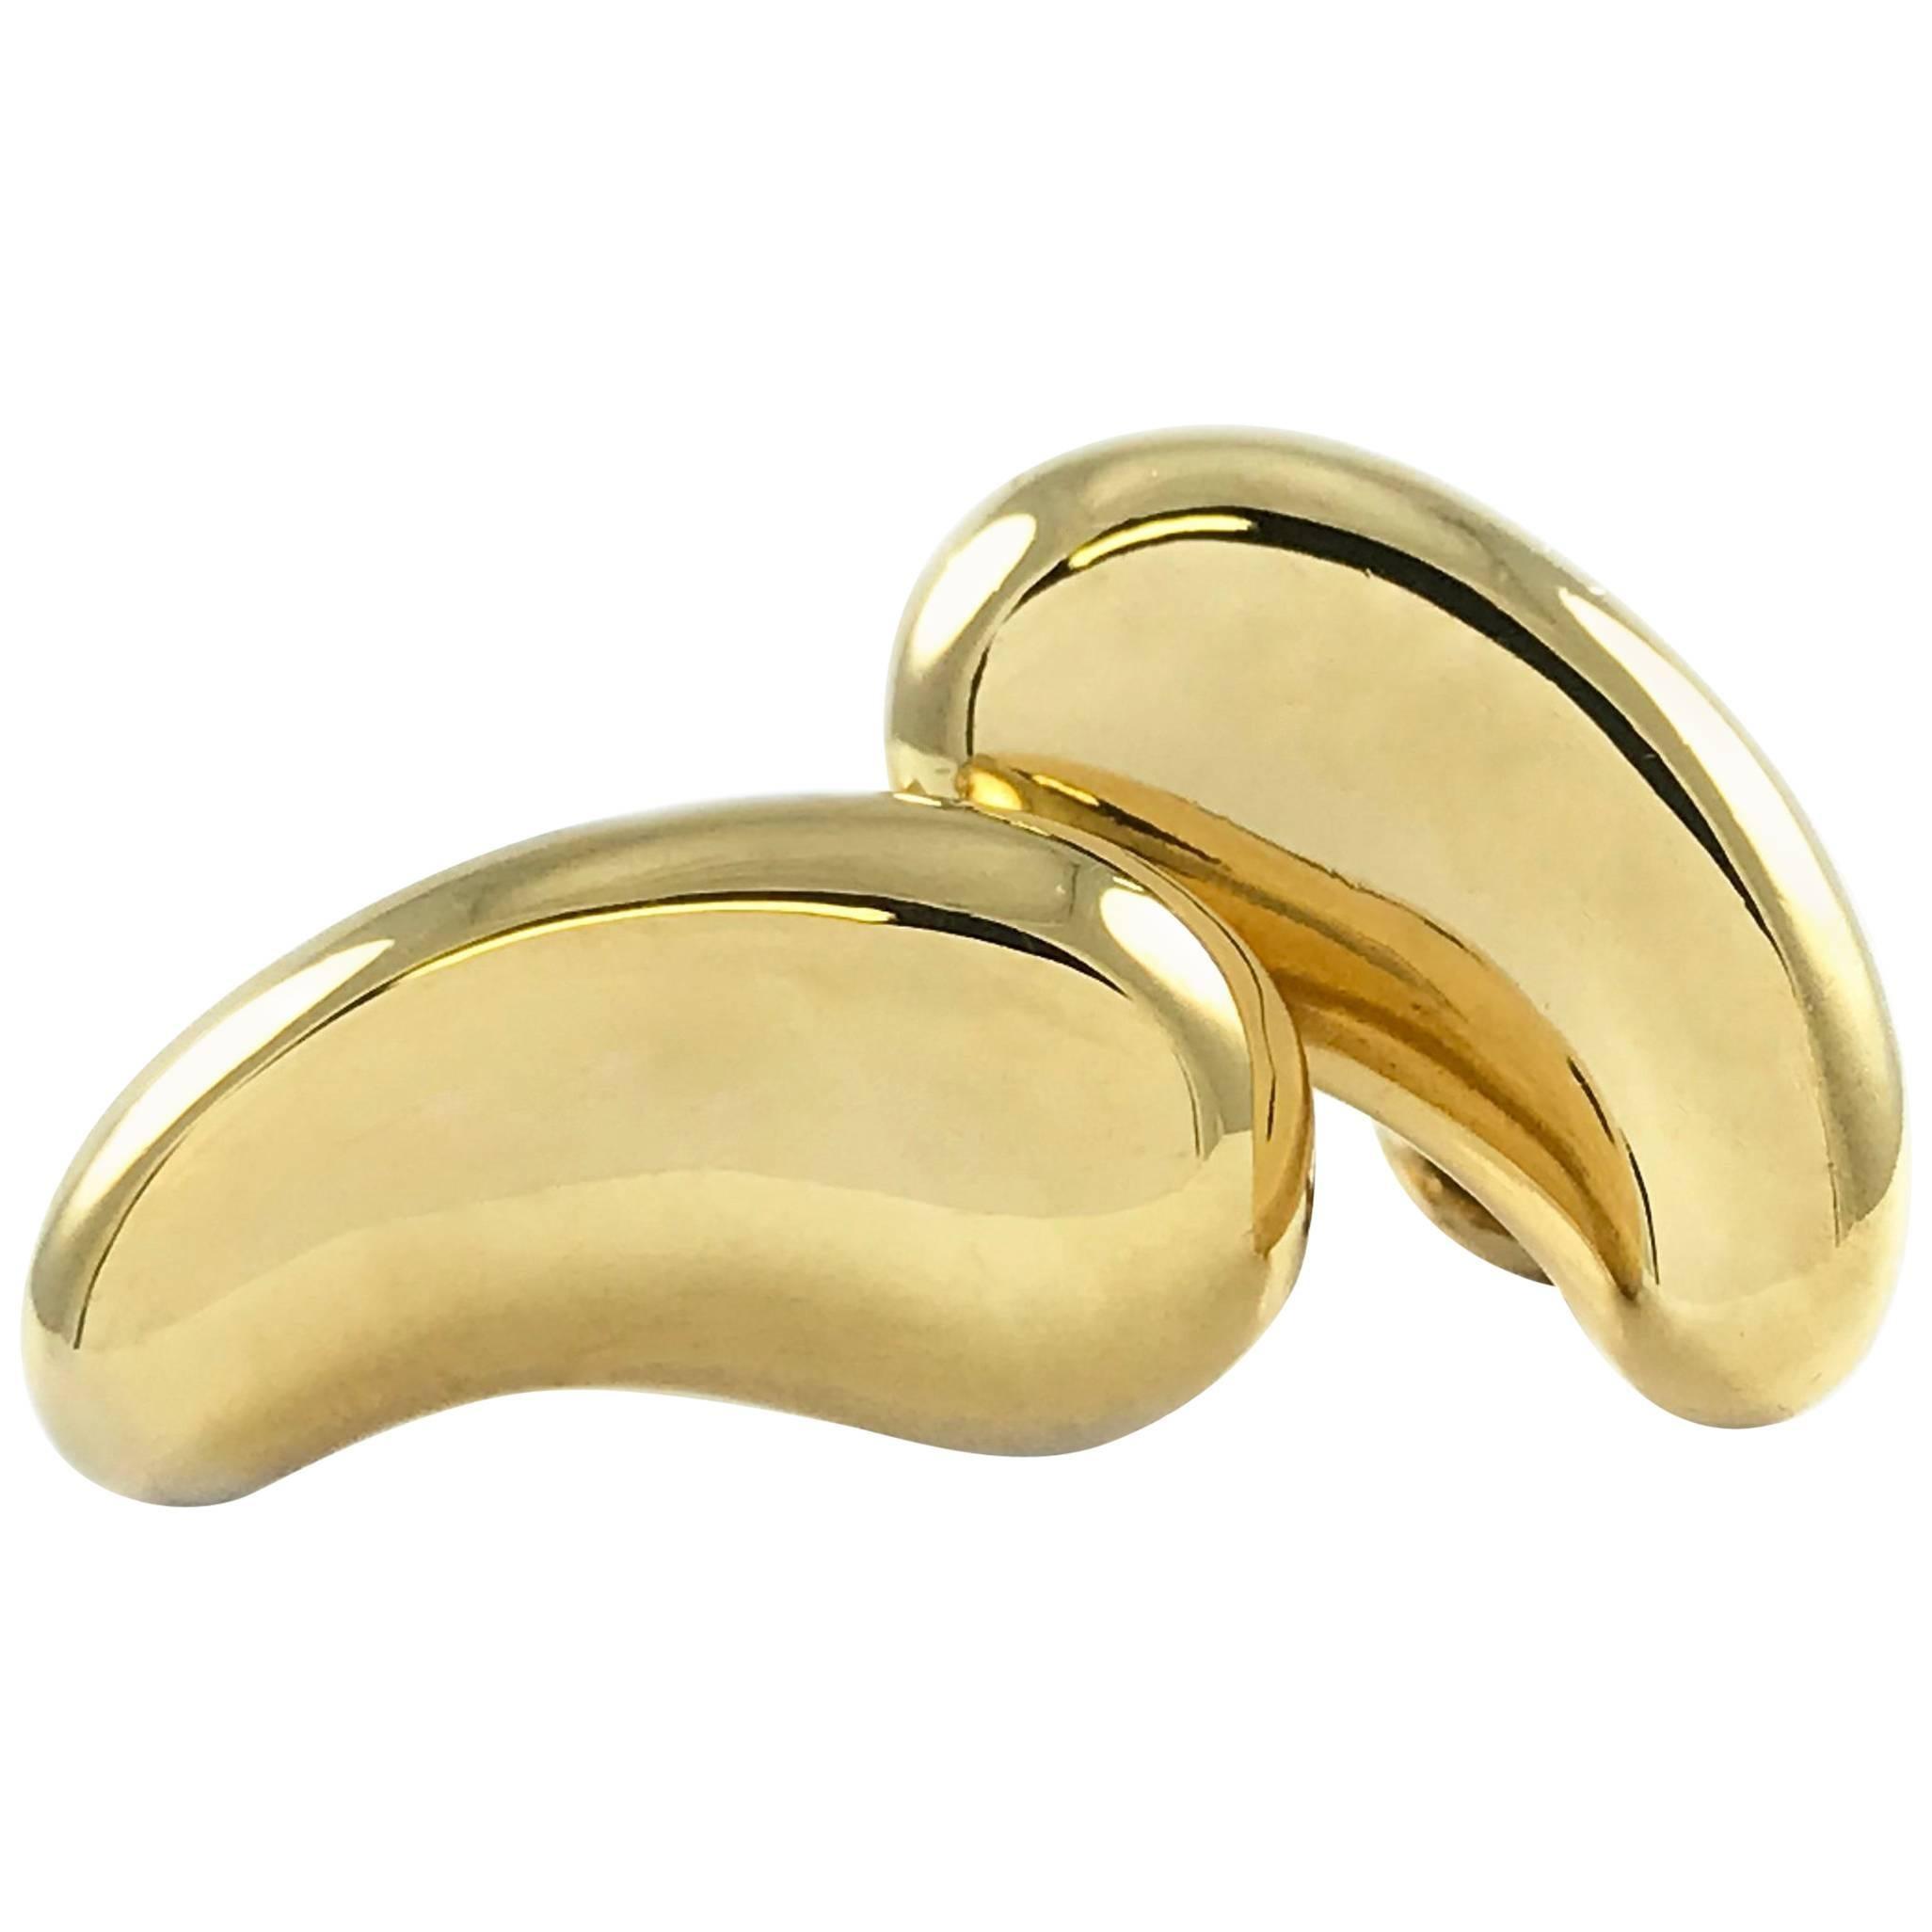 "Tiffany & Co. 18 Karat Gold Elsa Peretti ""Bean""Earrings"